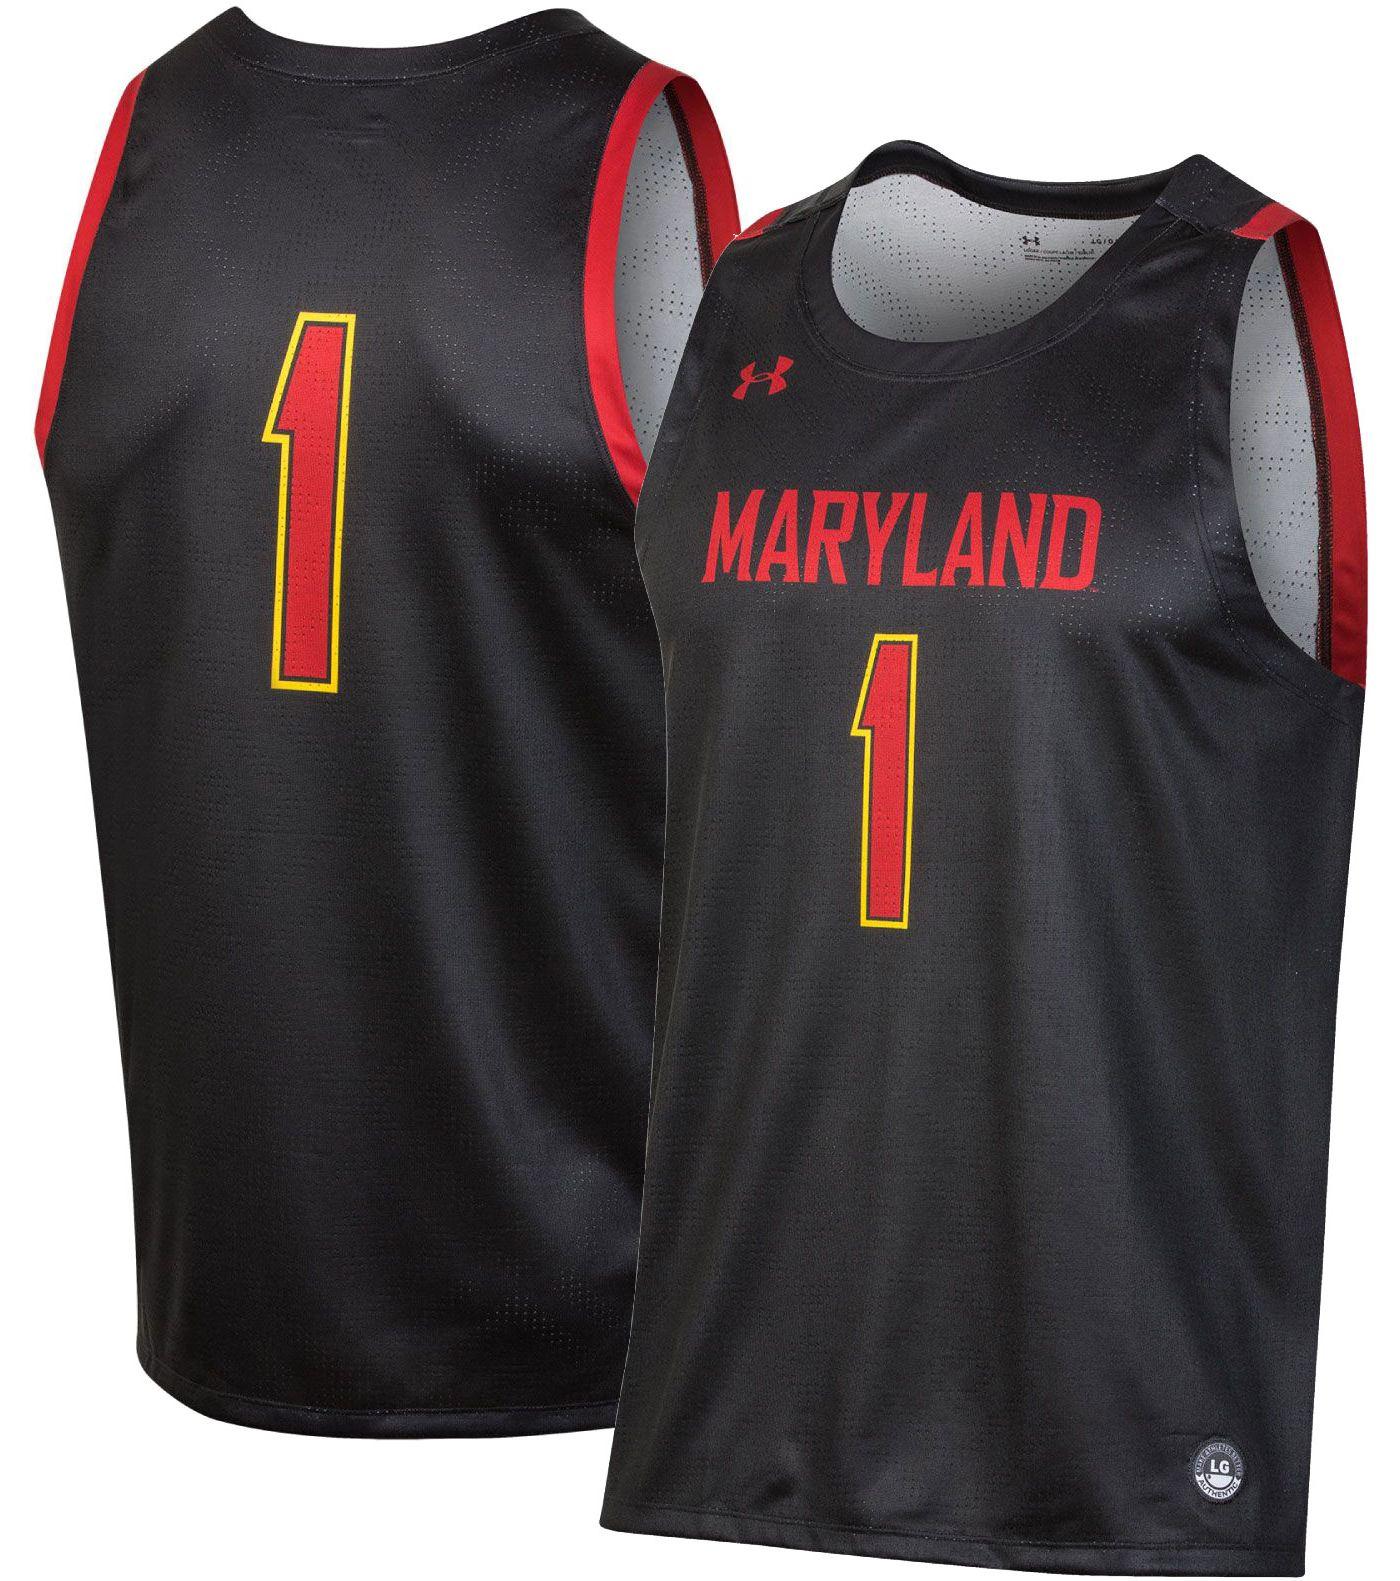 Under Armour Men's Maryland Terrapins #1 Replica Basketball Black Jersey